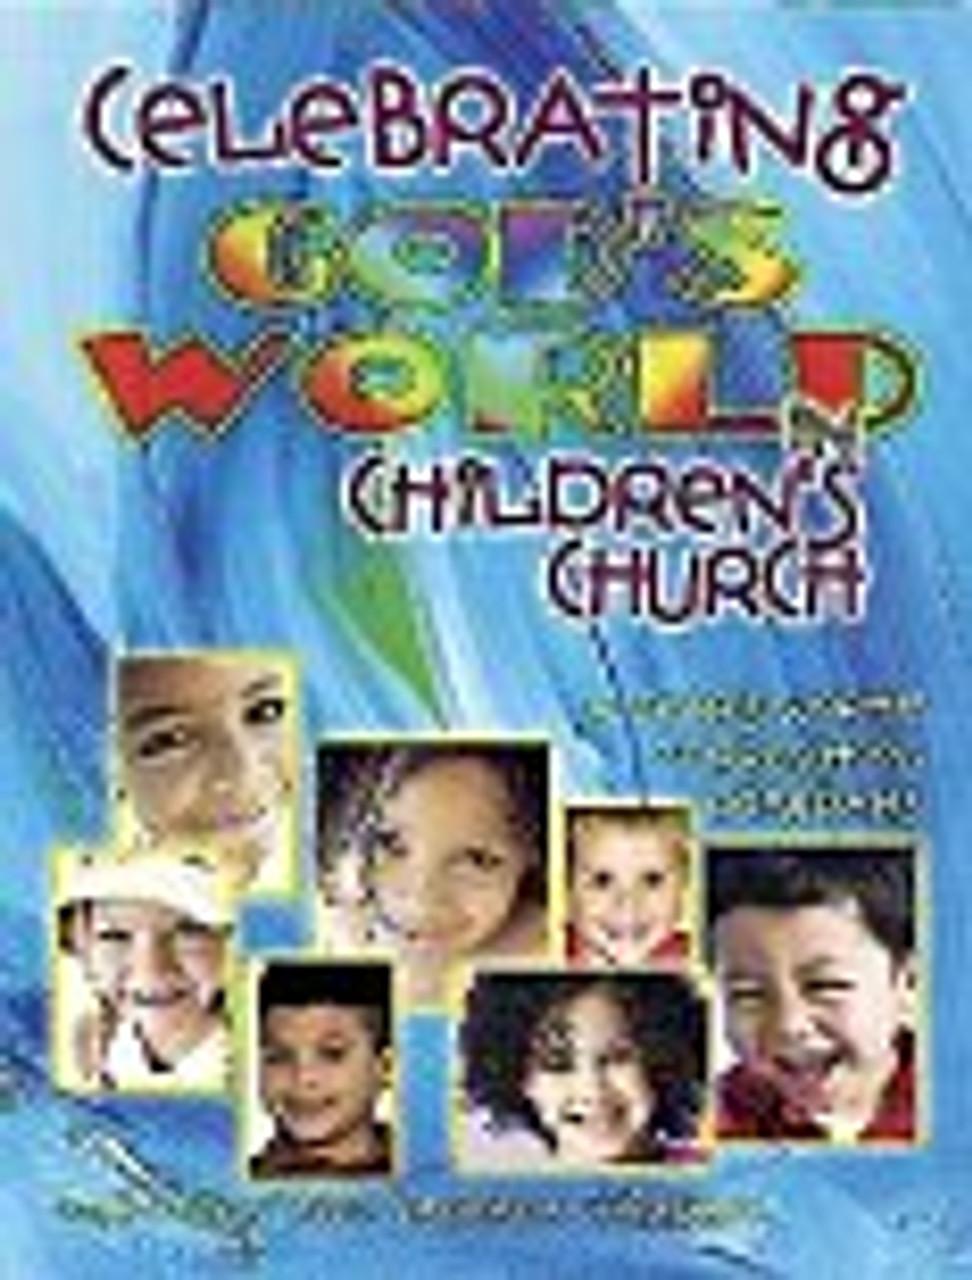 Celebrating God's World in Children's Church